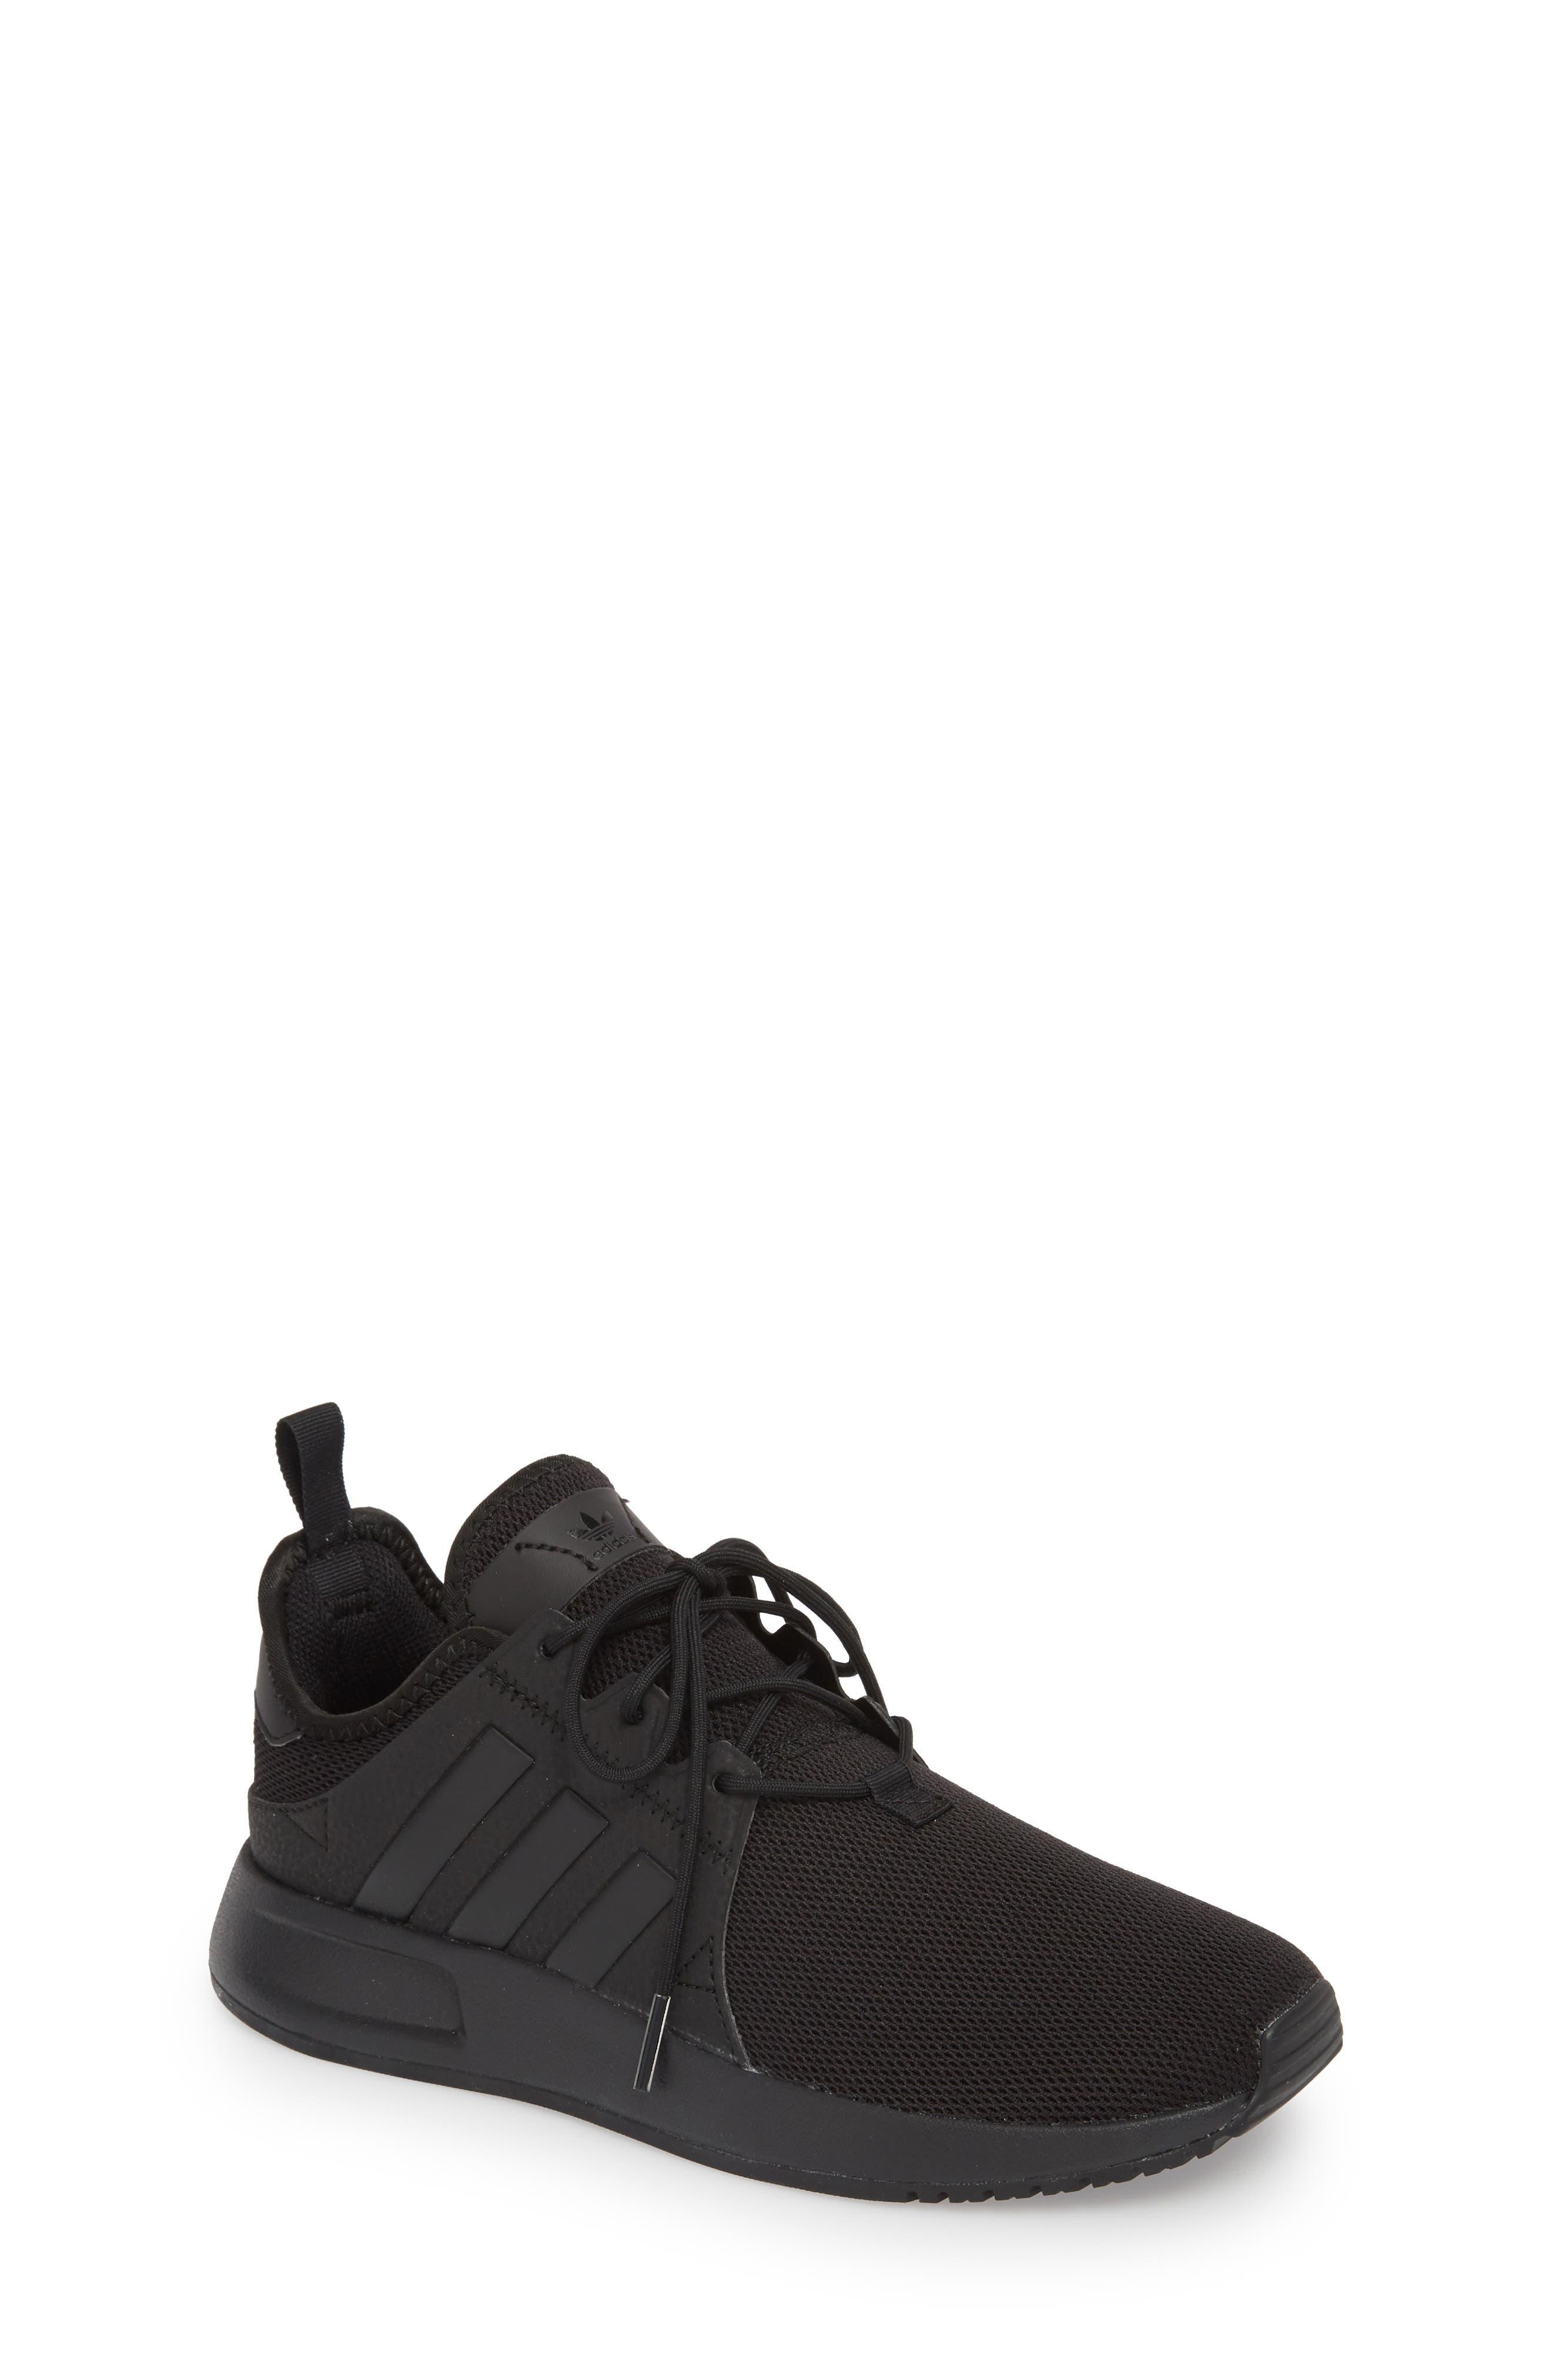 Toddler Adidas X Plr Sneaker Size 10 M  Black